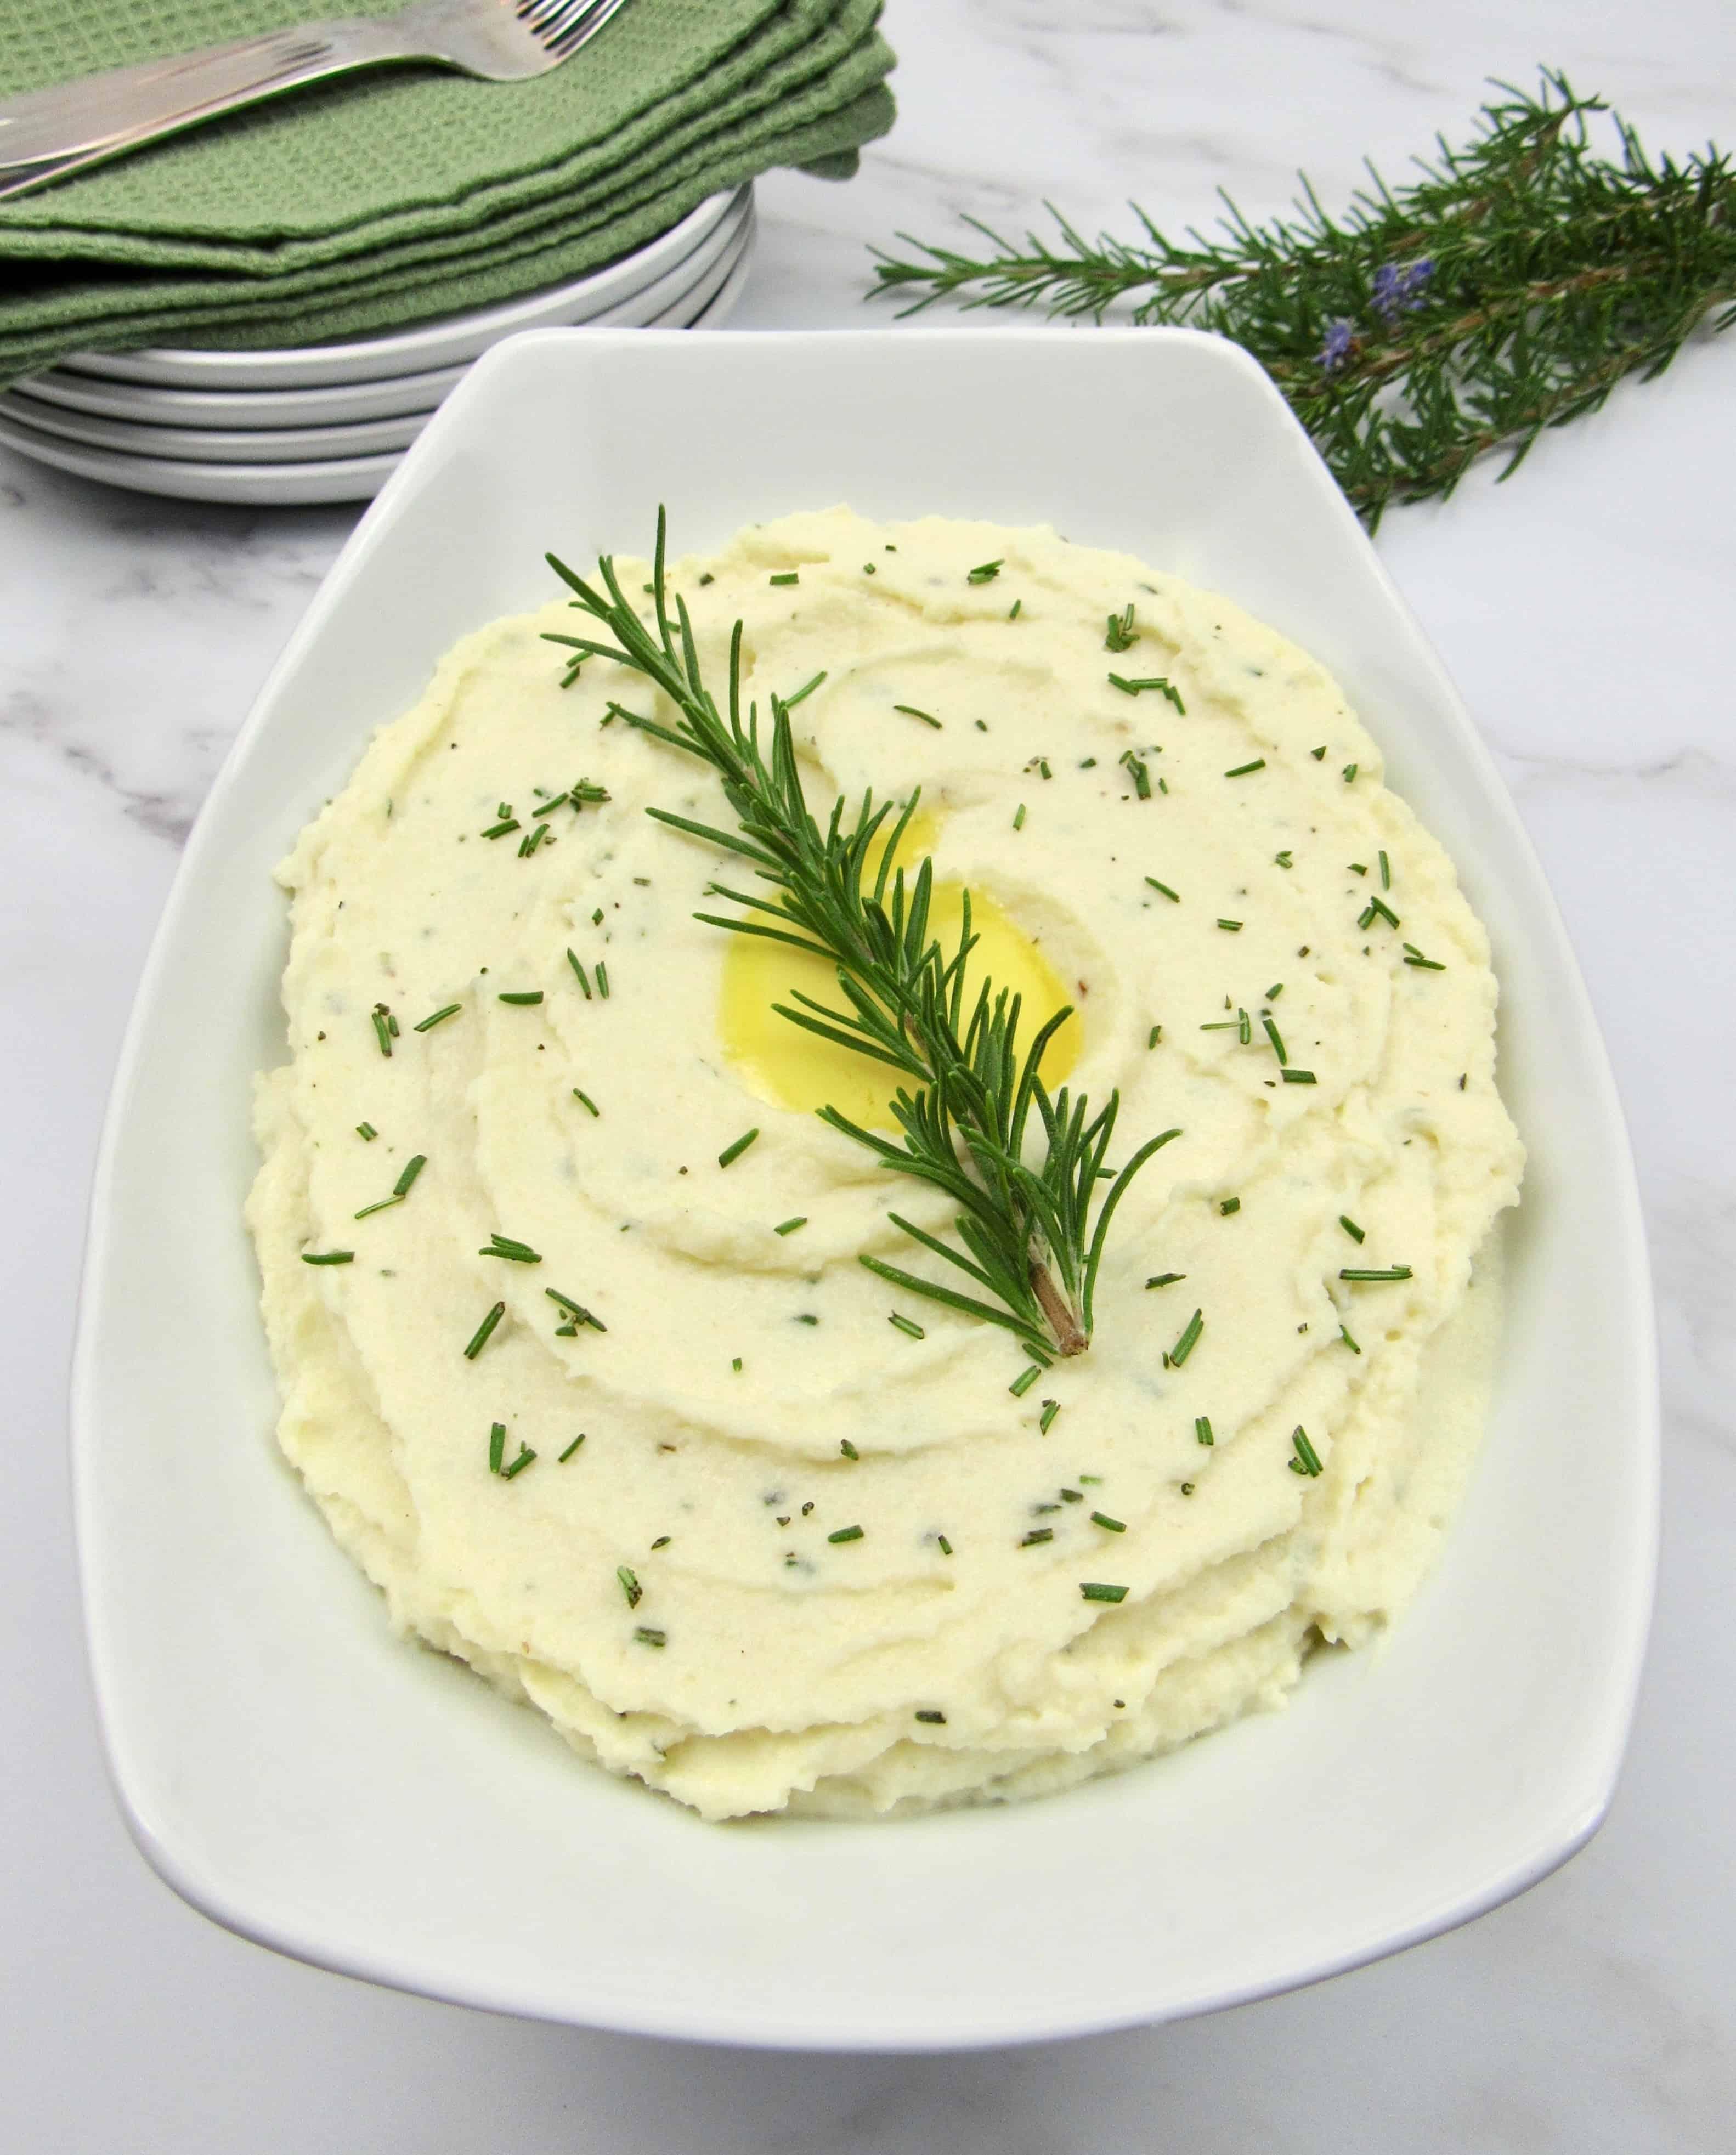 white bowl with mashed cauliflower with rosemary sprig garnish